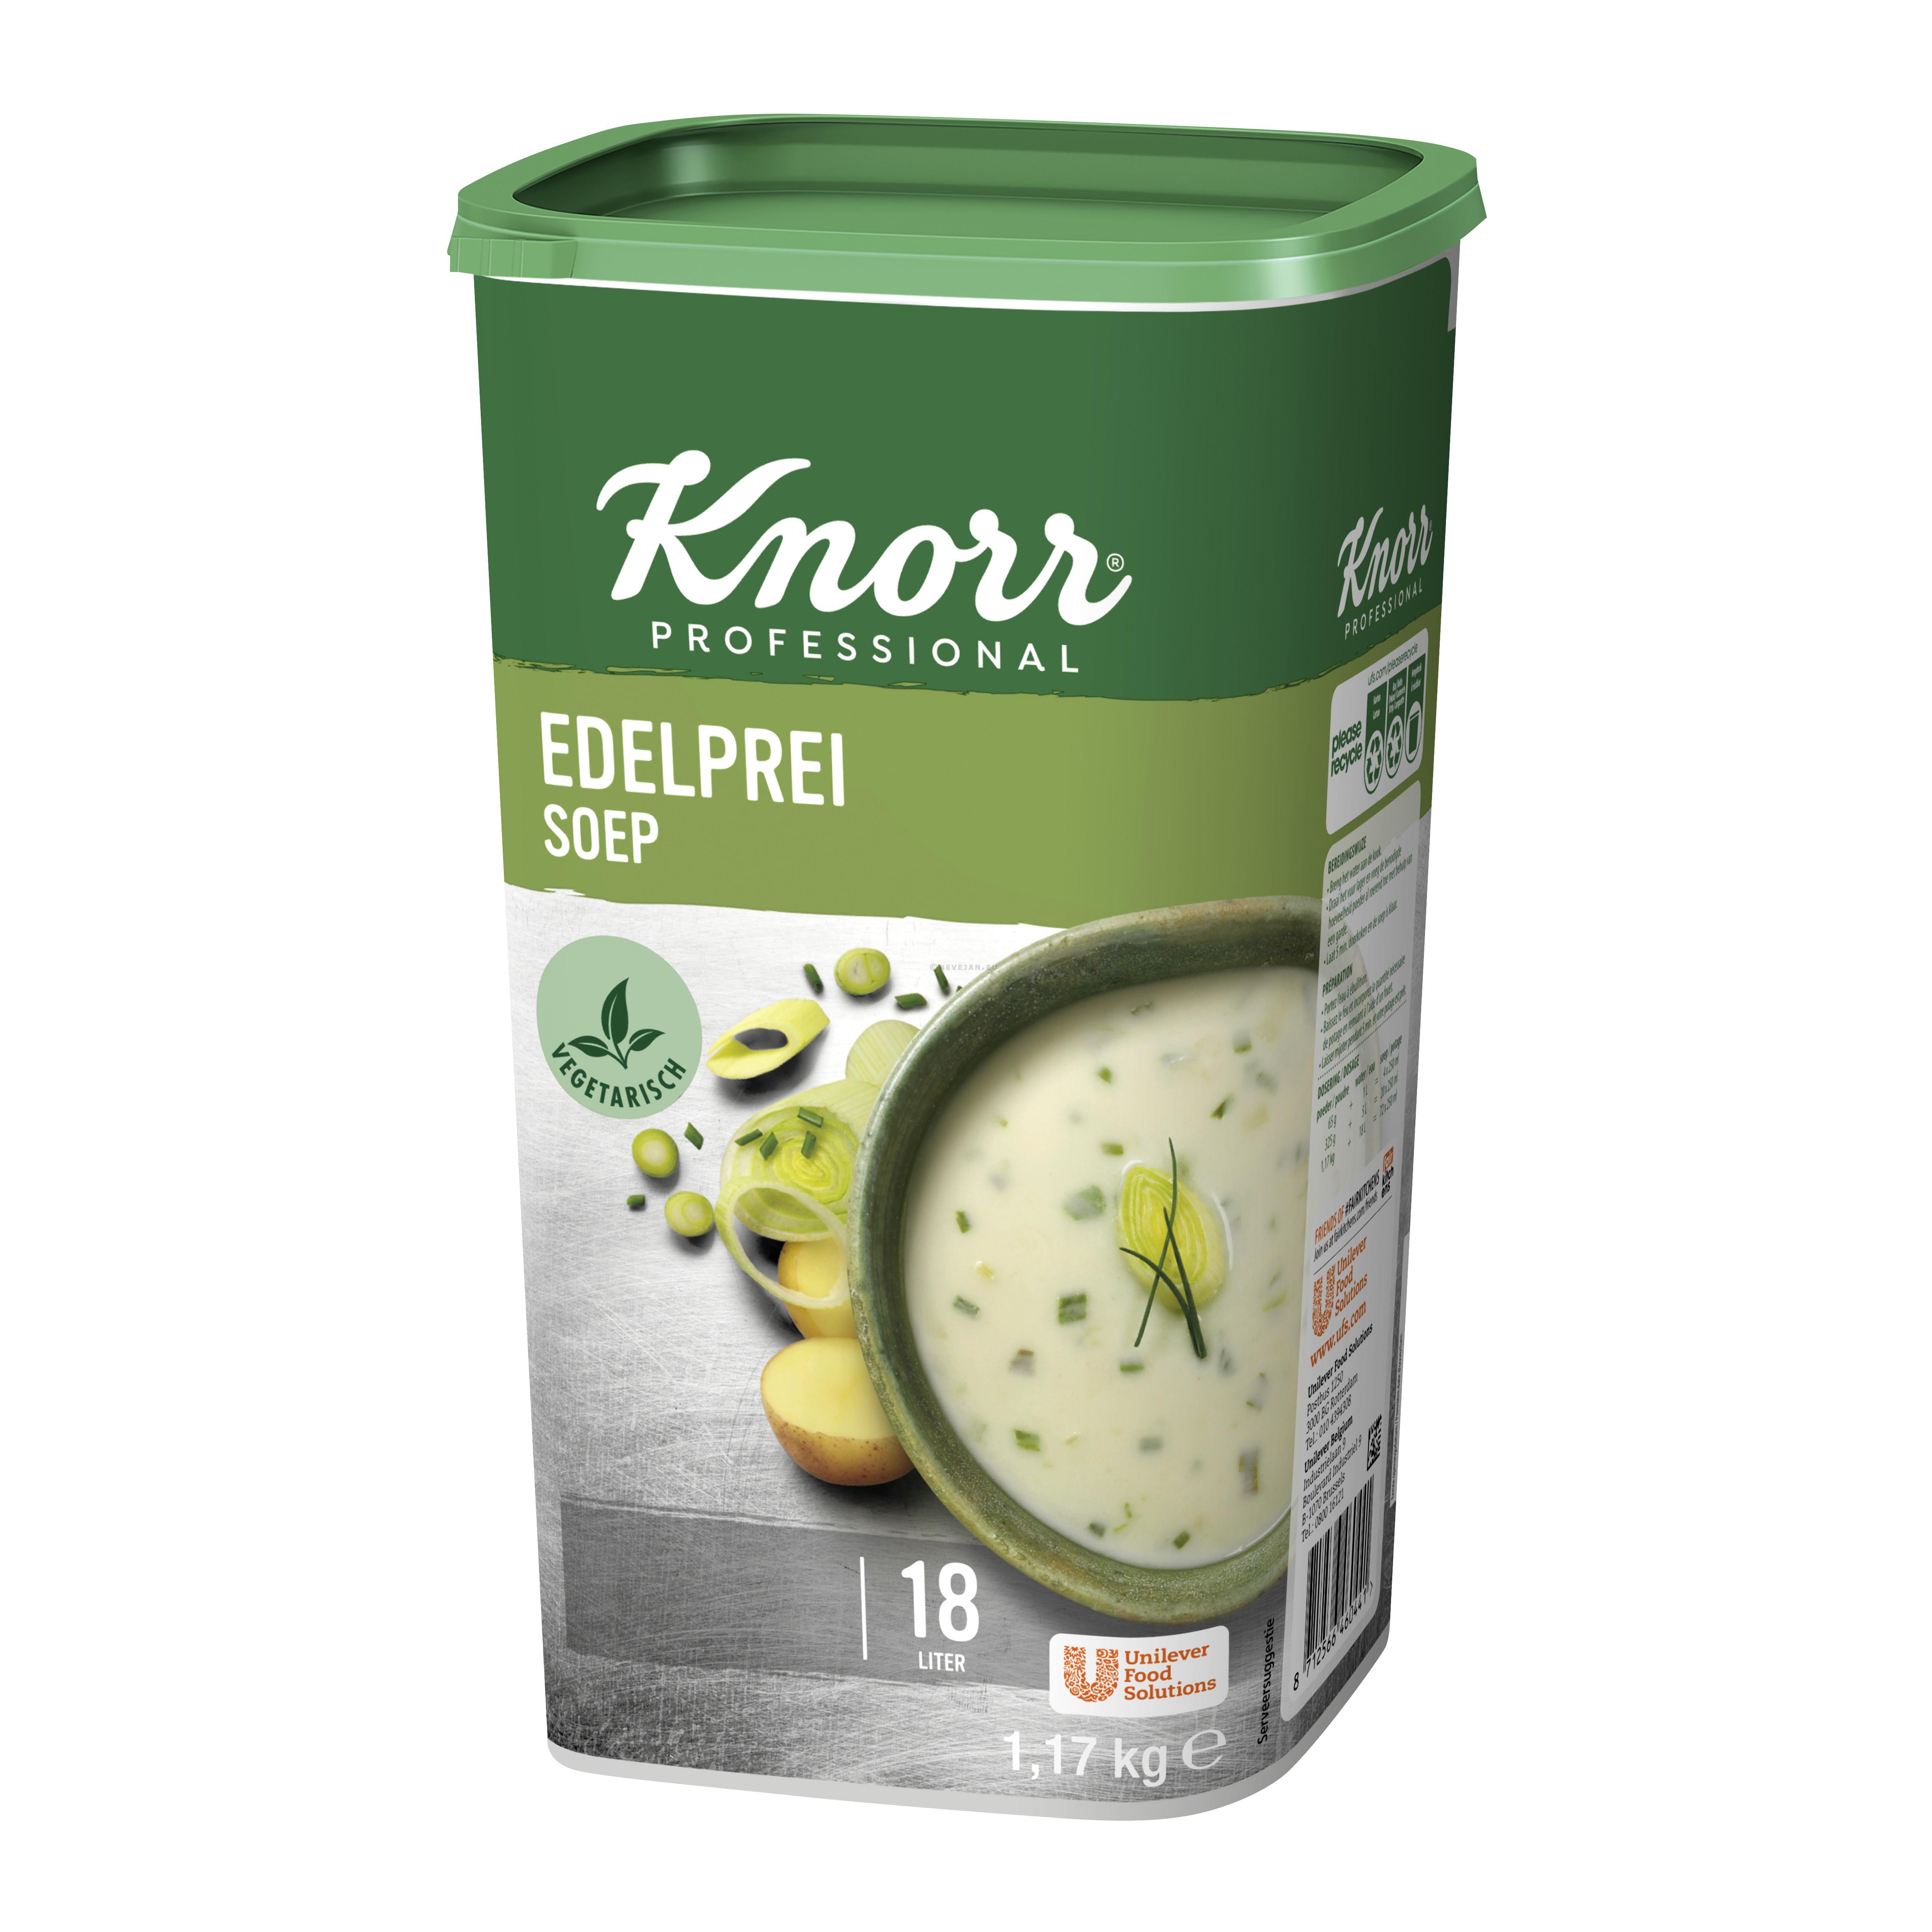 Knorr edelpreisoep 1.17kg Professional